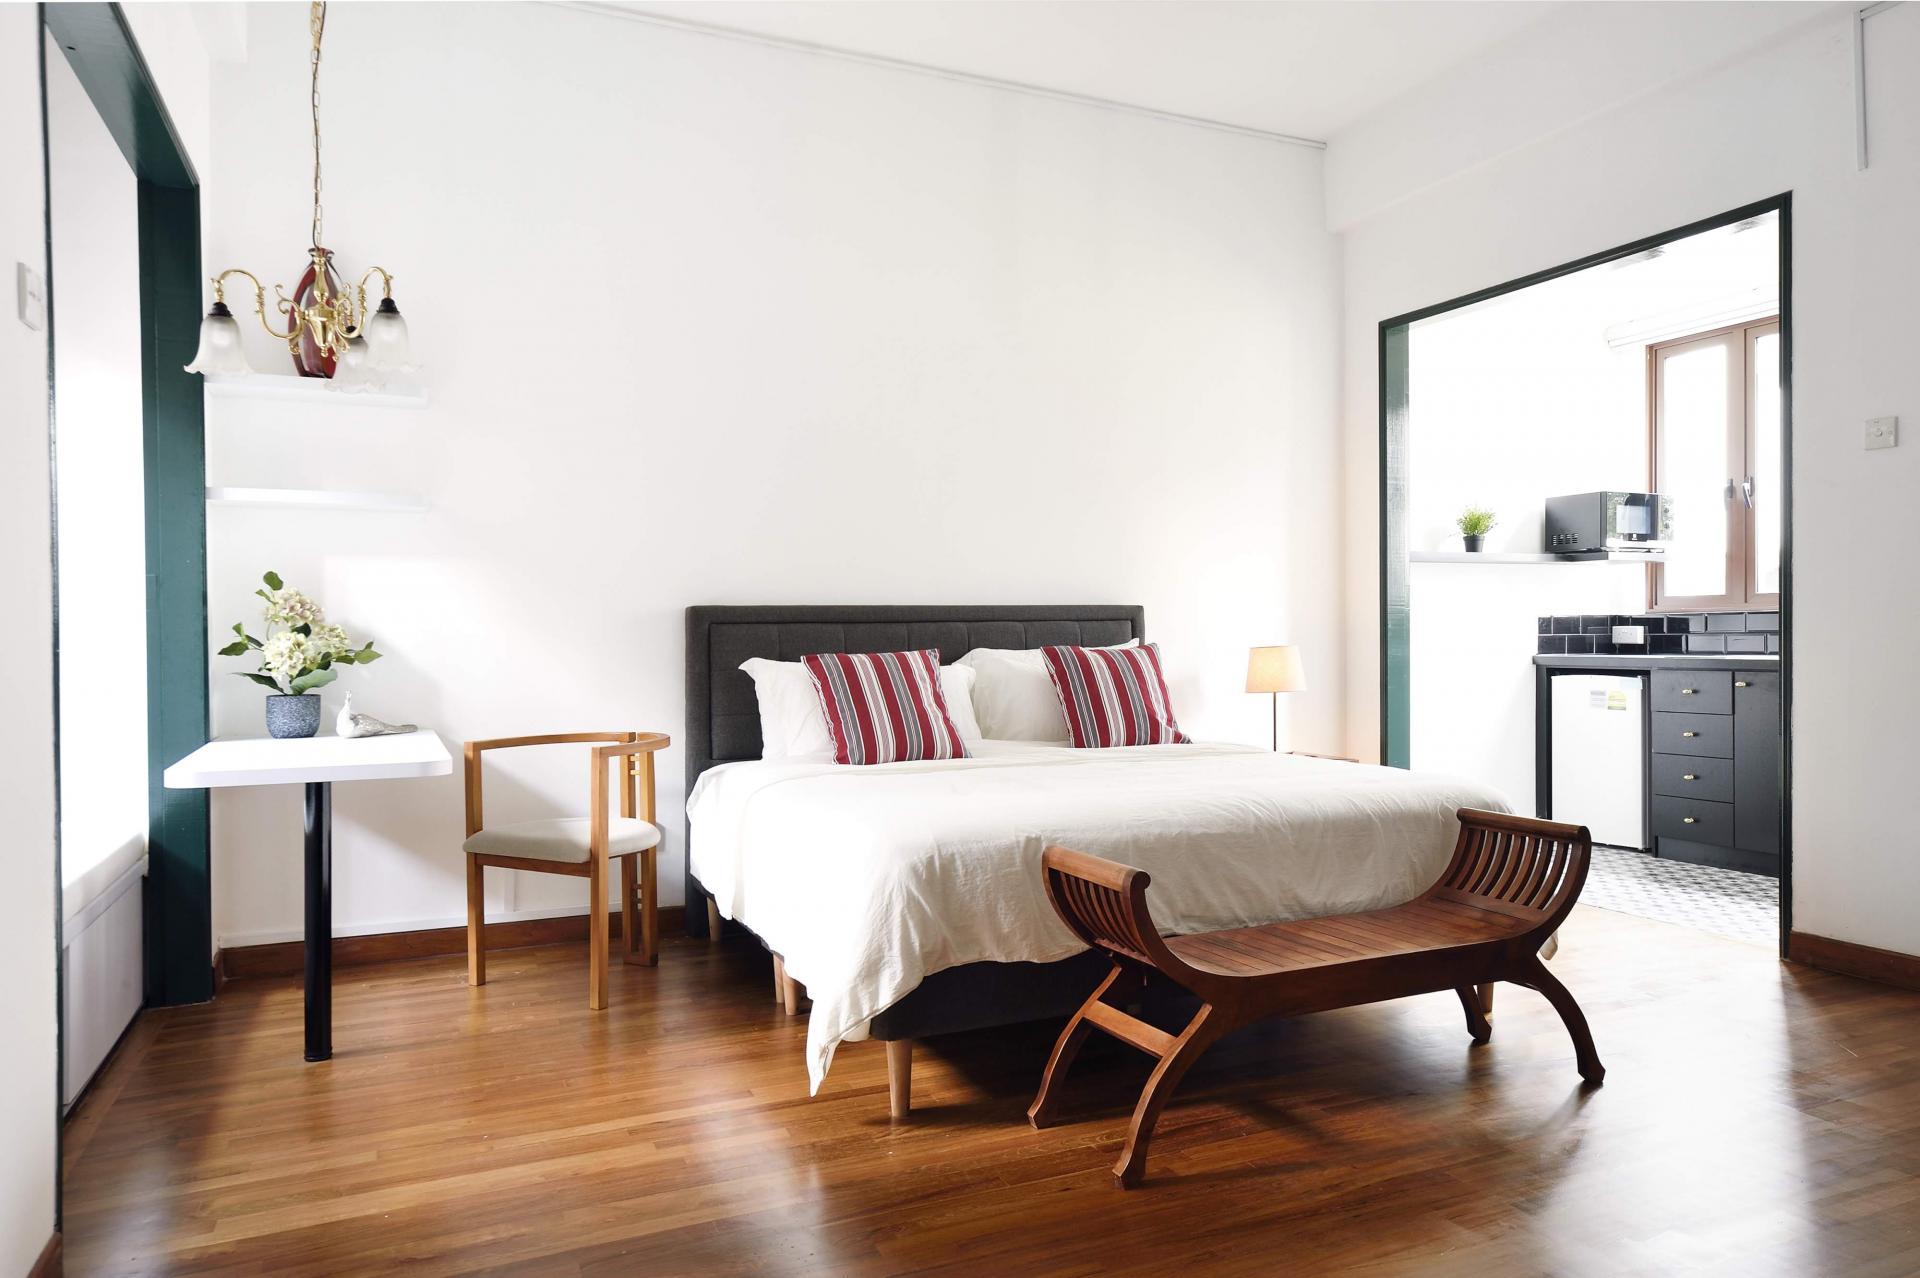 Bedroom at Cavenagh House Apartments, Kallang, Singapore